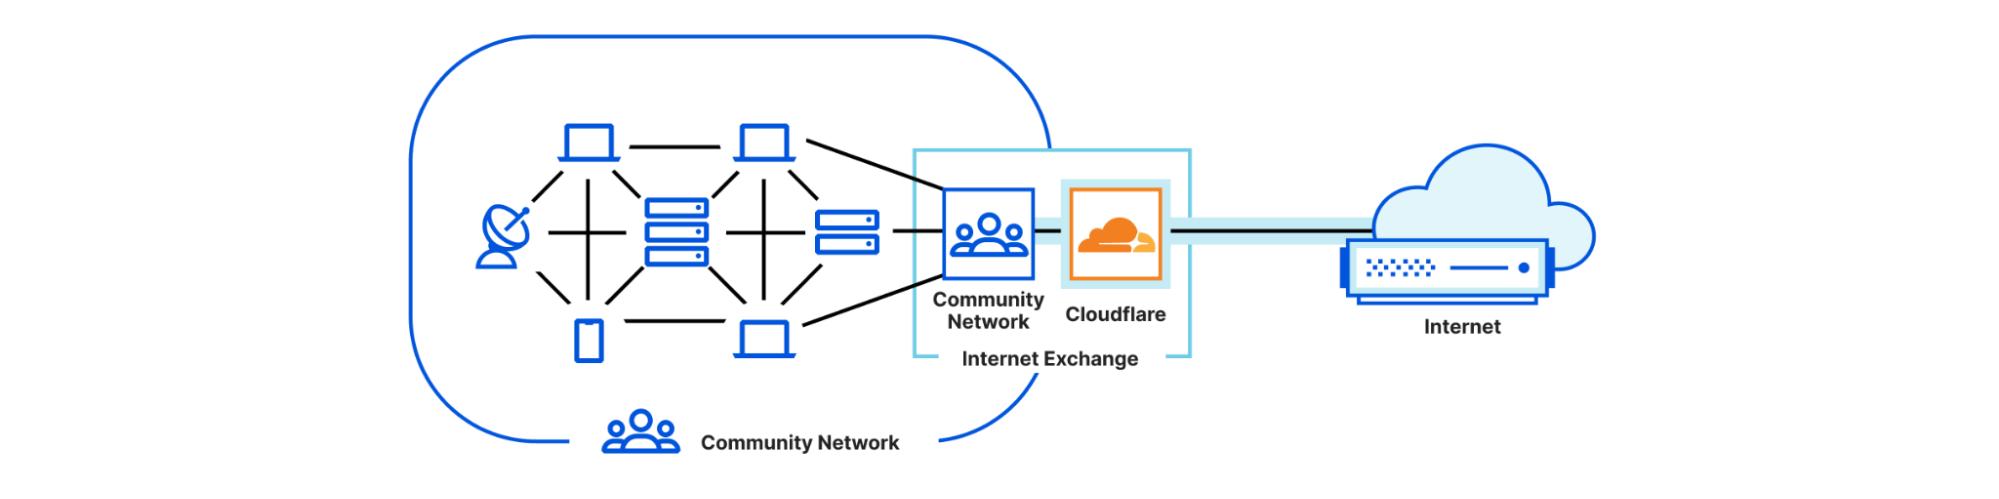 Colocation Community Network